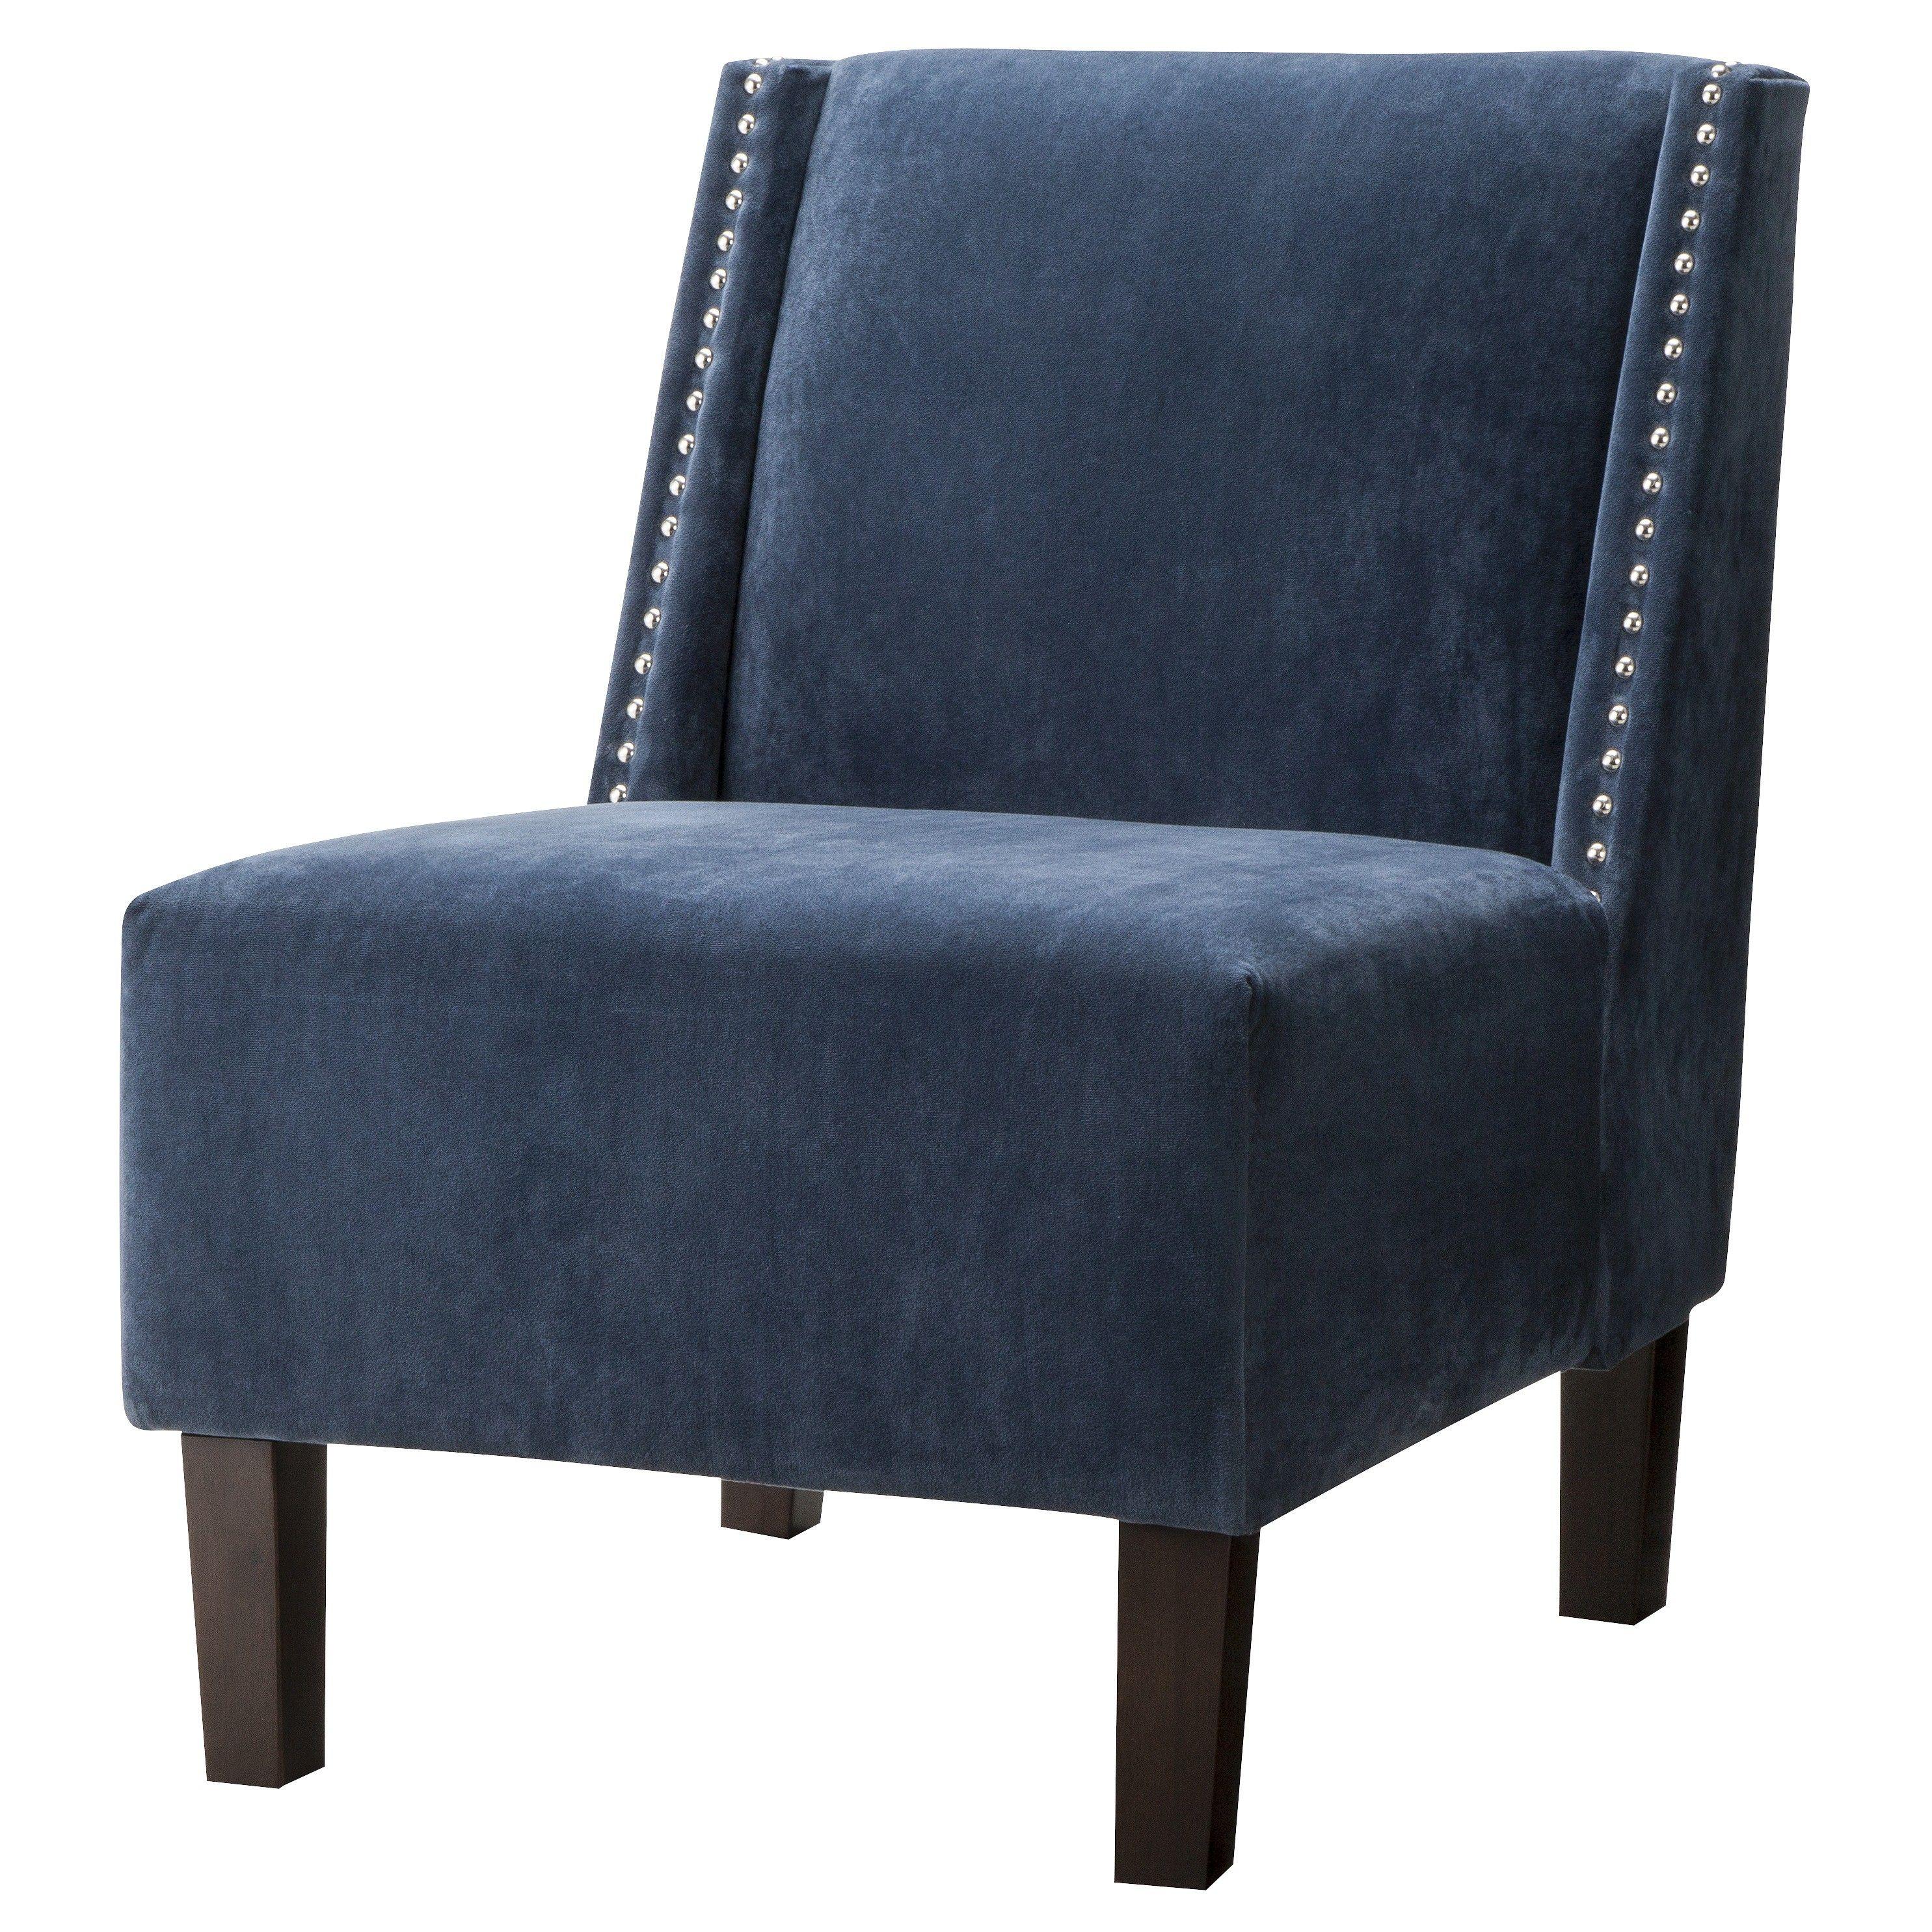 Hayden Armless Chair - Solids : Target   Armless chair ...